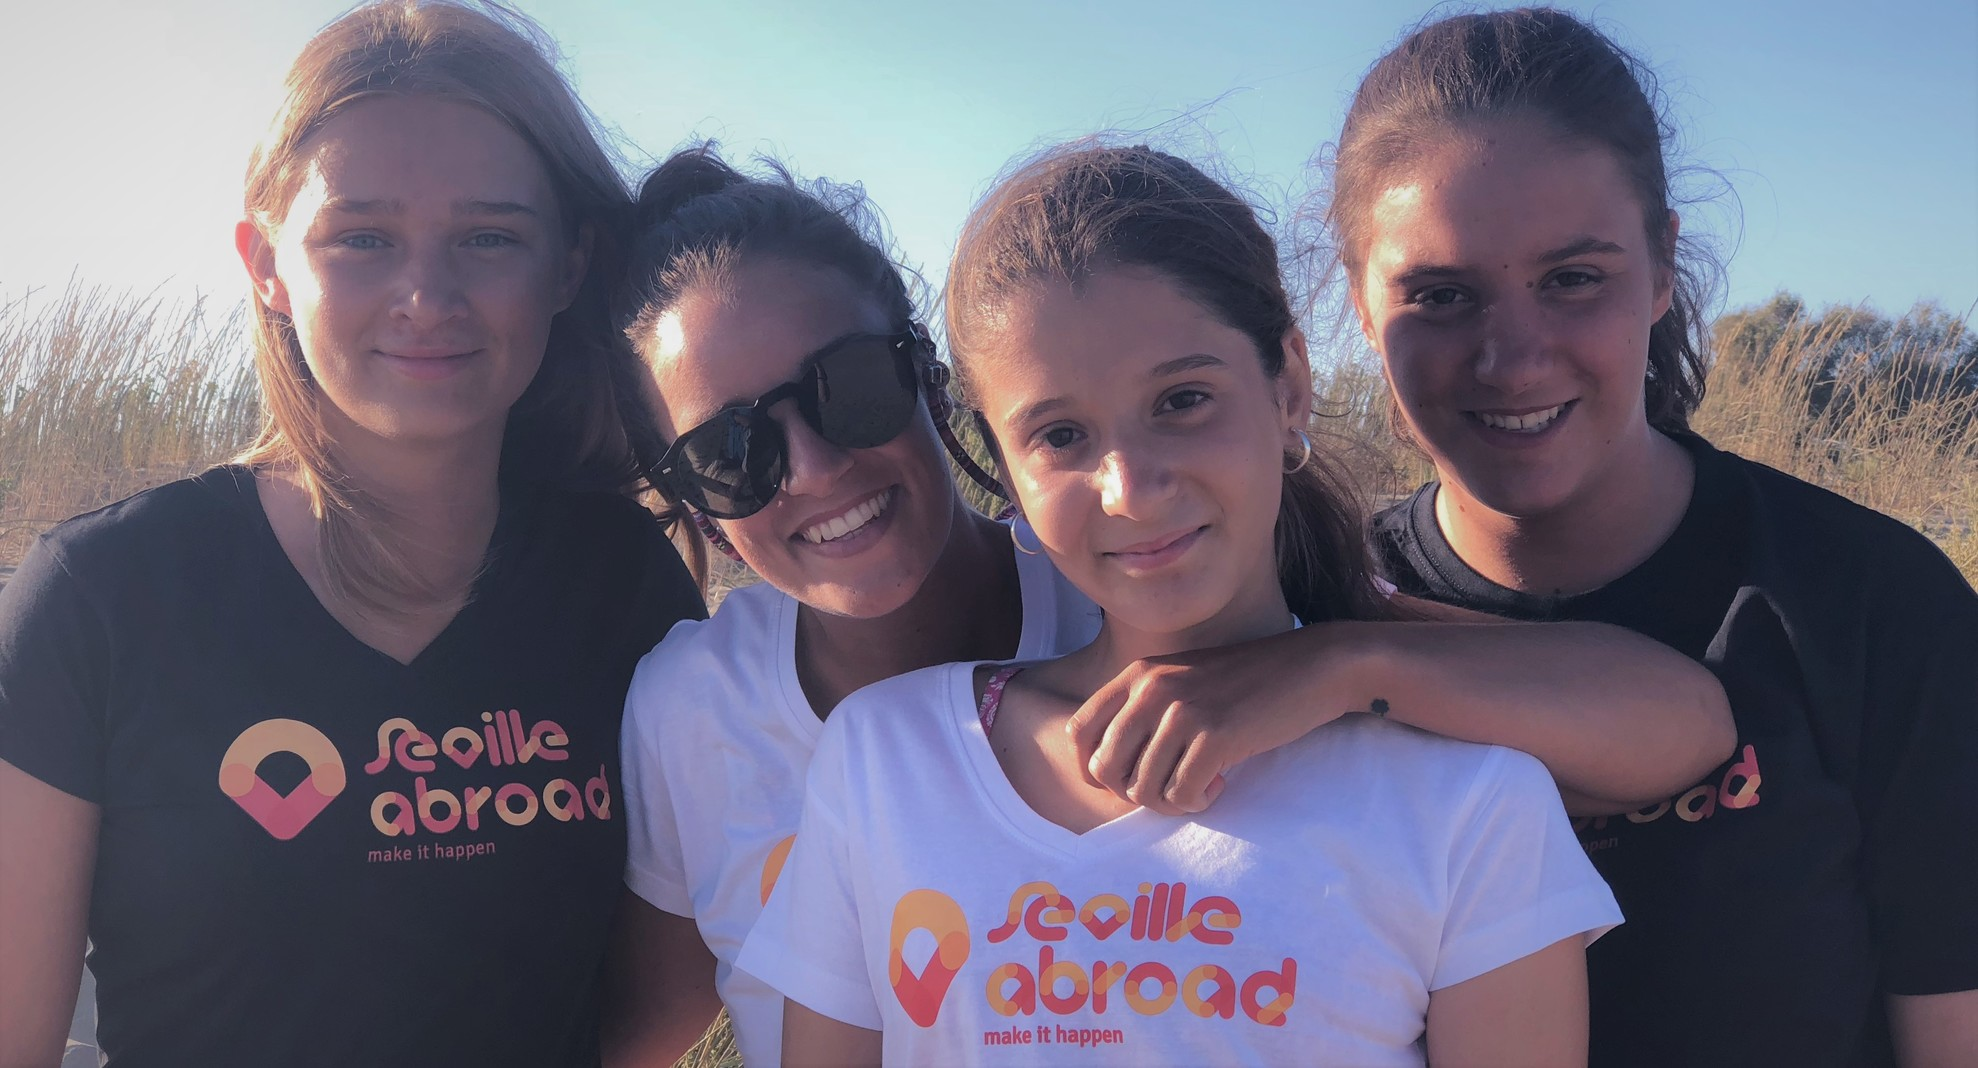 Summer Program - Spanish | Seville Abroad: Summer Program in Spain